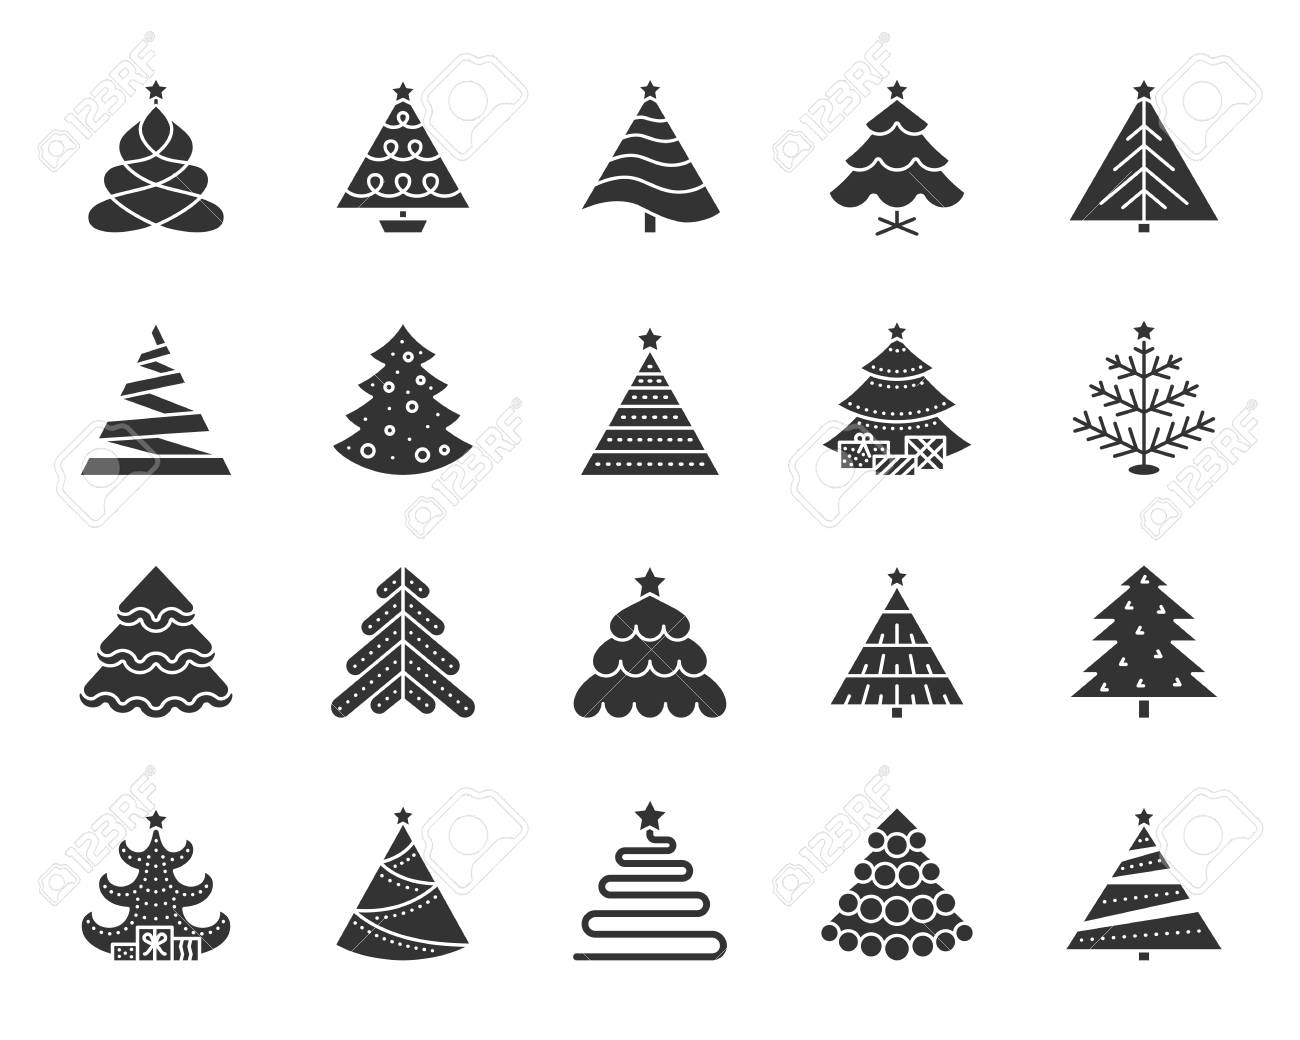 Christmas Tree Icons.Christmas Tree Icons Set Sign Kit Of Xmas Trendy Spruce Stylized